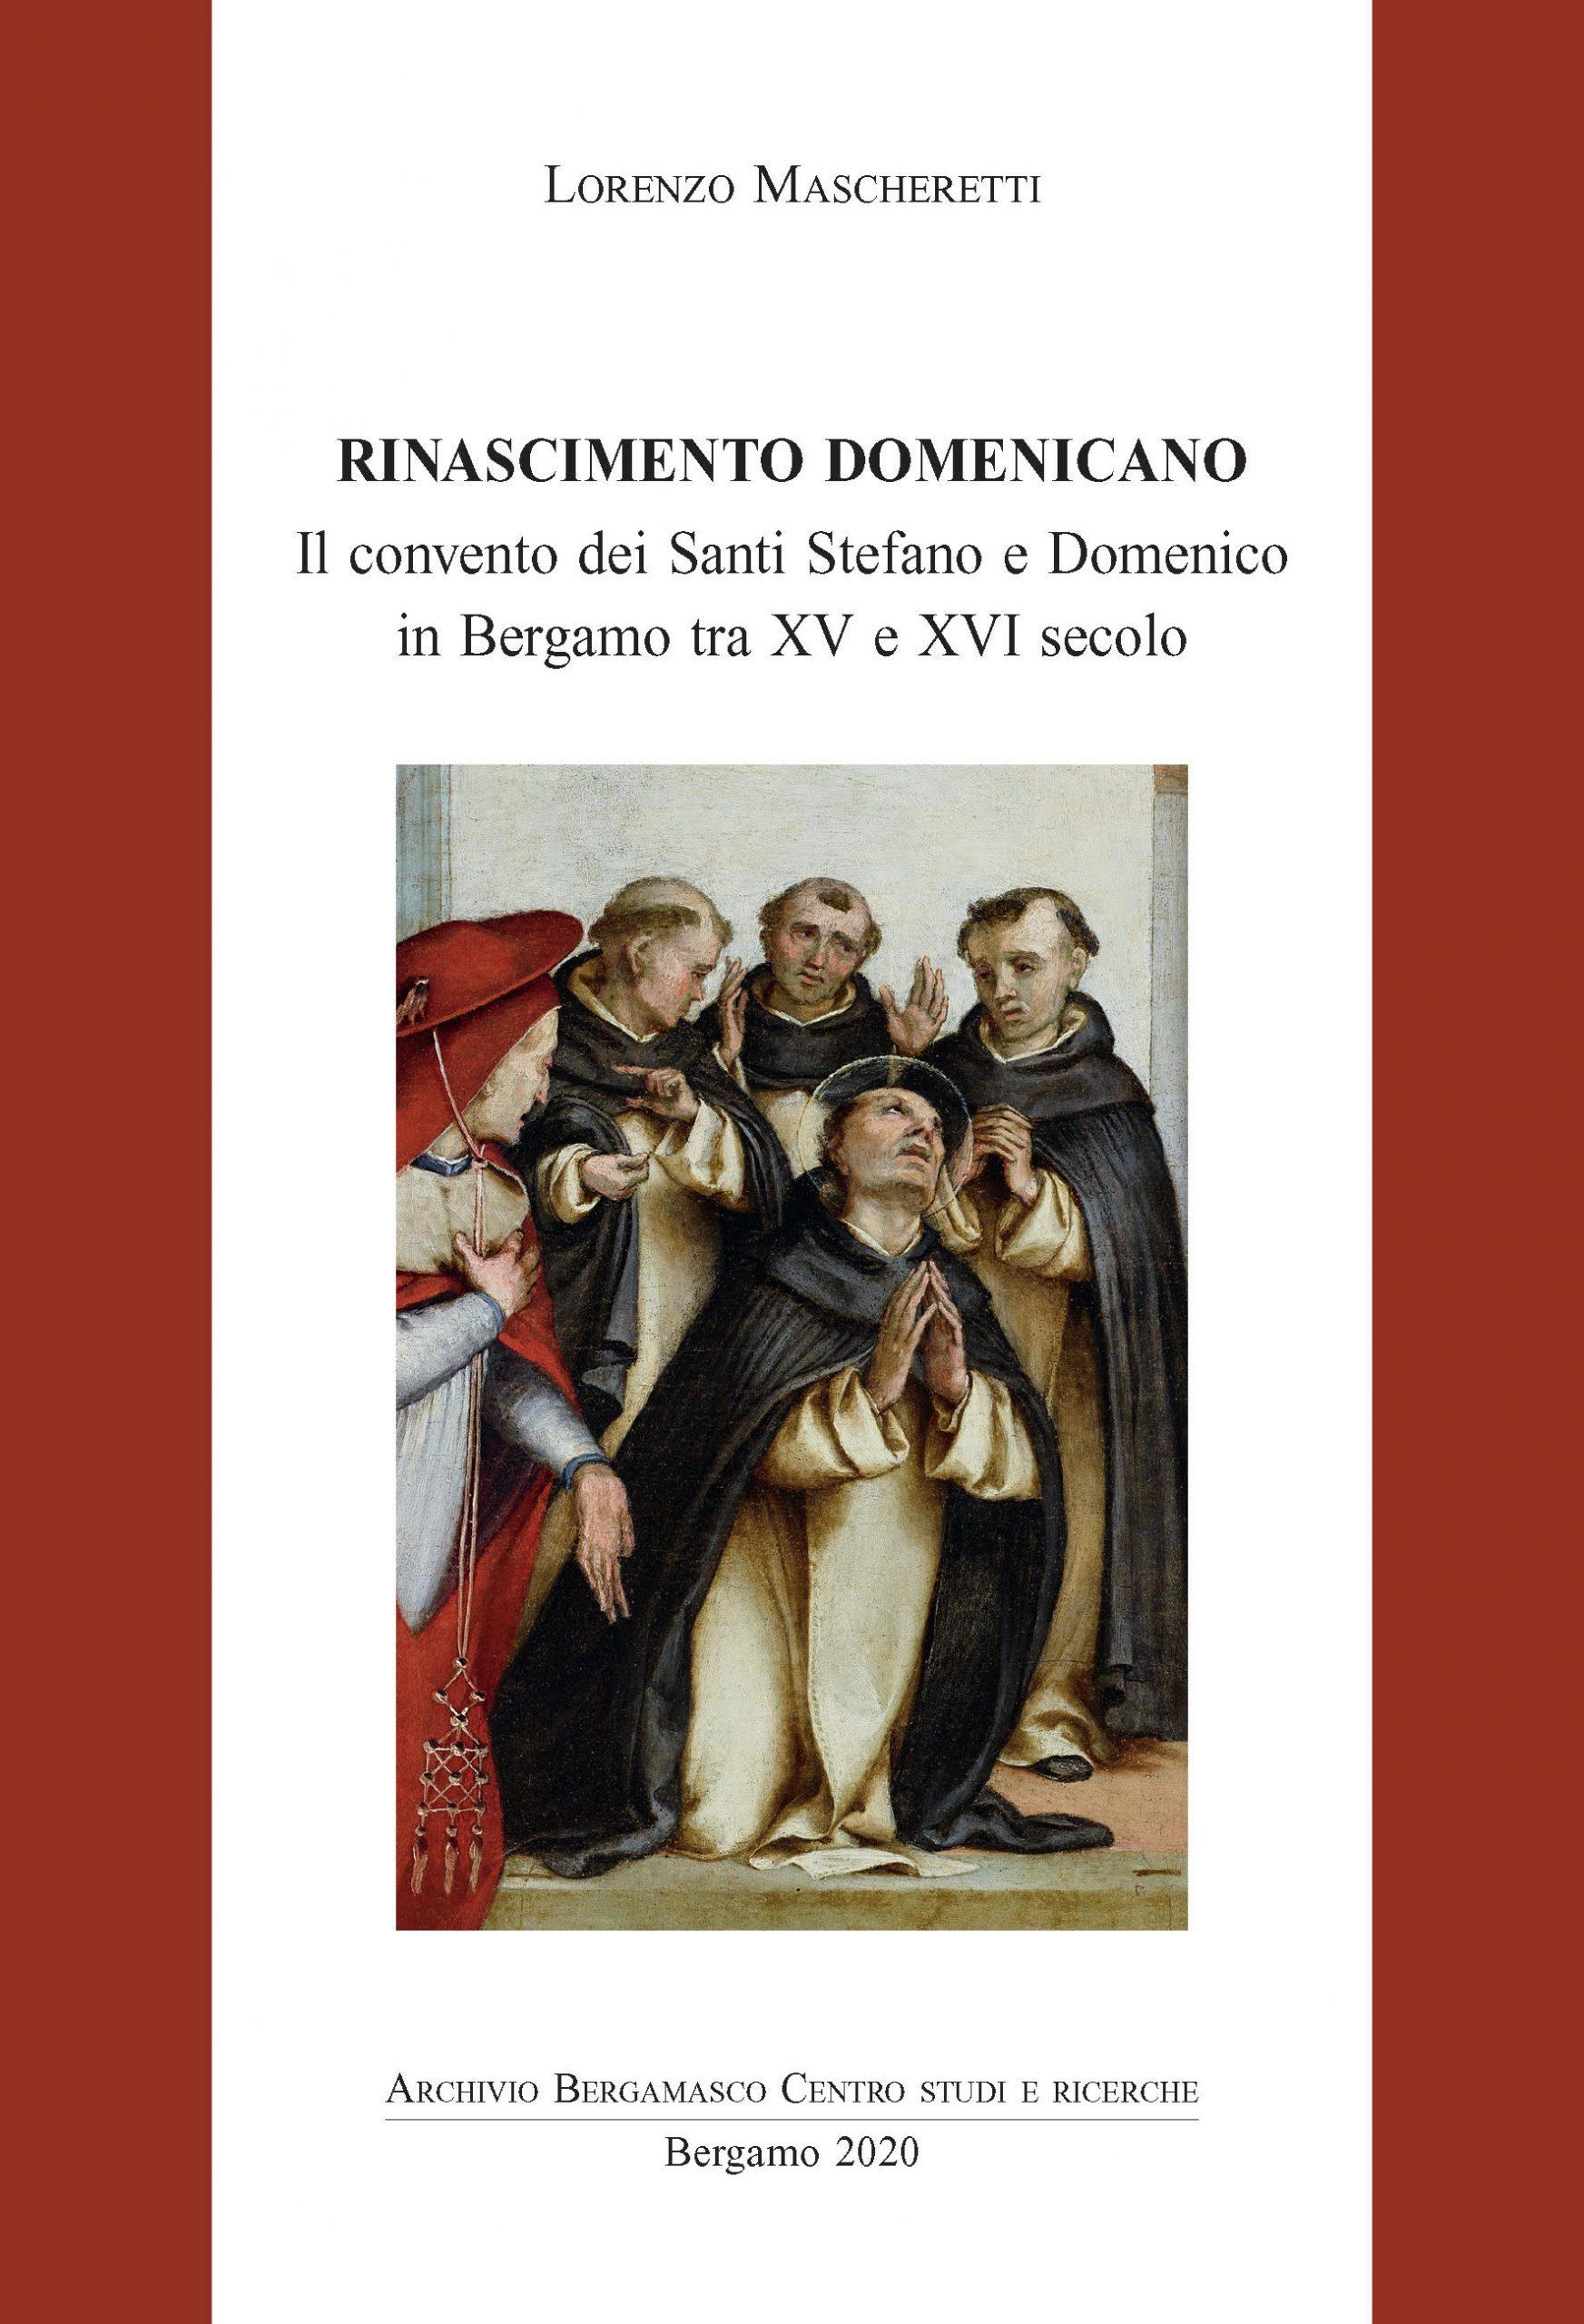 Lorenzo Mascheretti, Rinascimento domenicano.